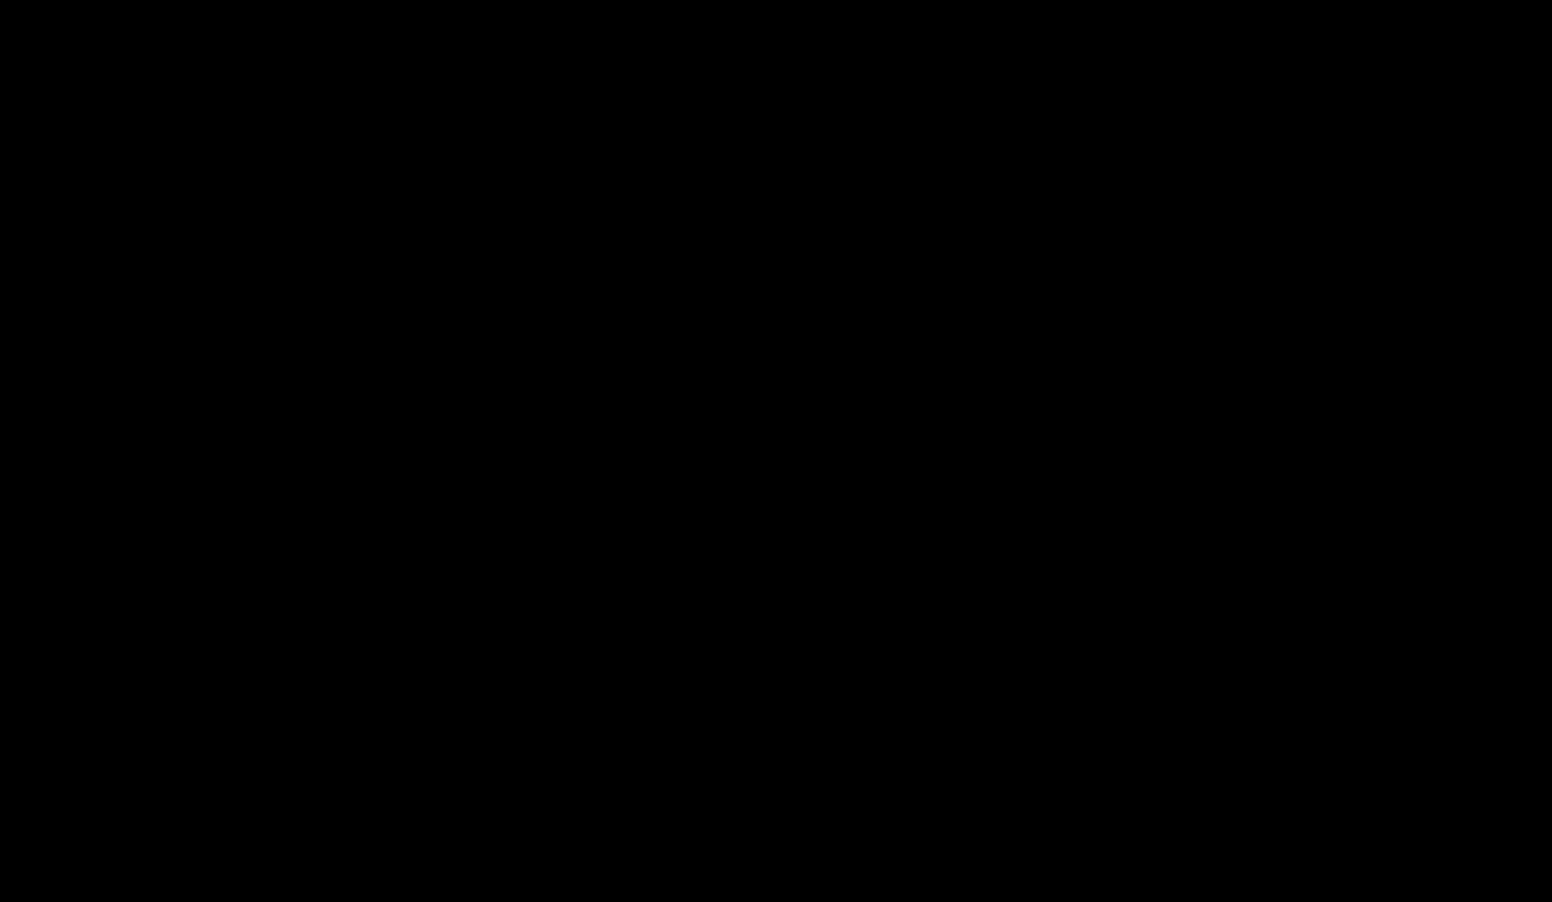 3-Fluoro-4-(3-pyridylcarbamoyl)benzeneboronic acid pinacol ester